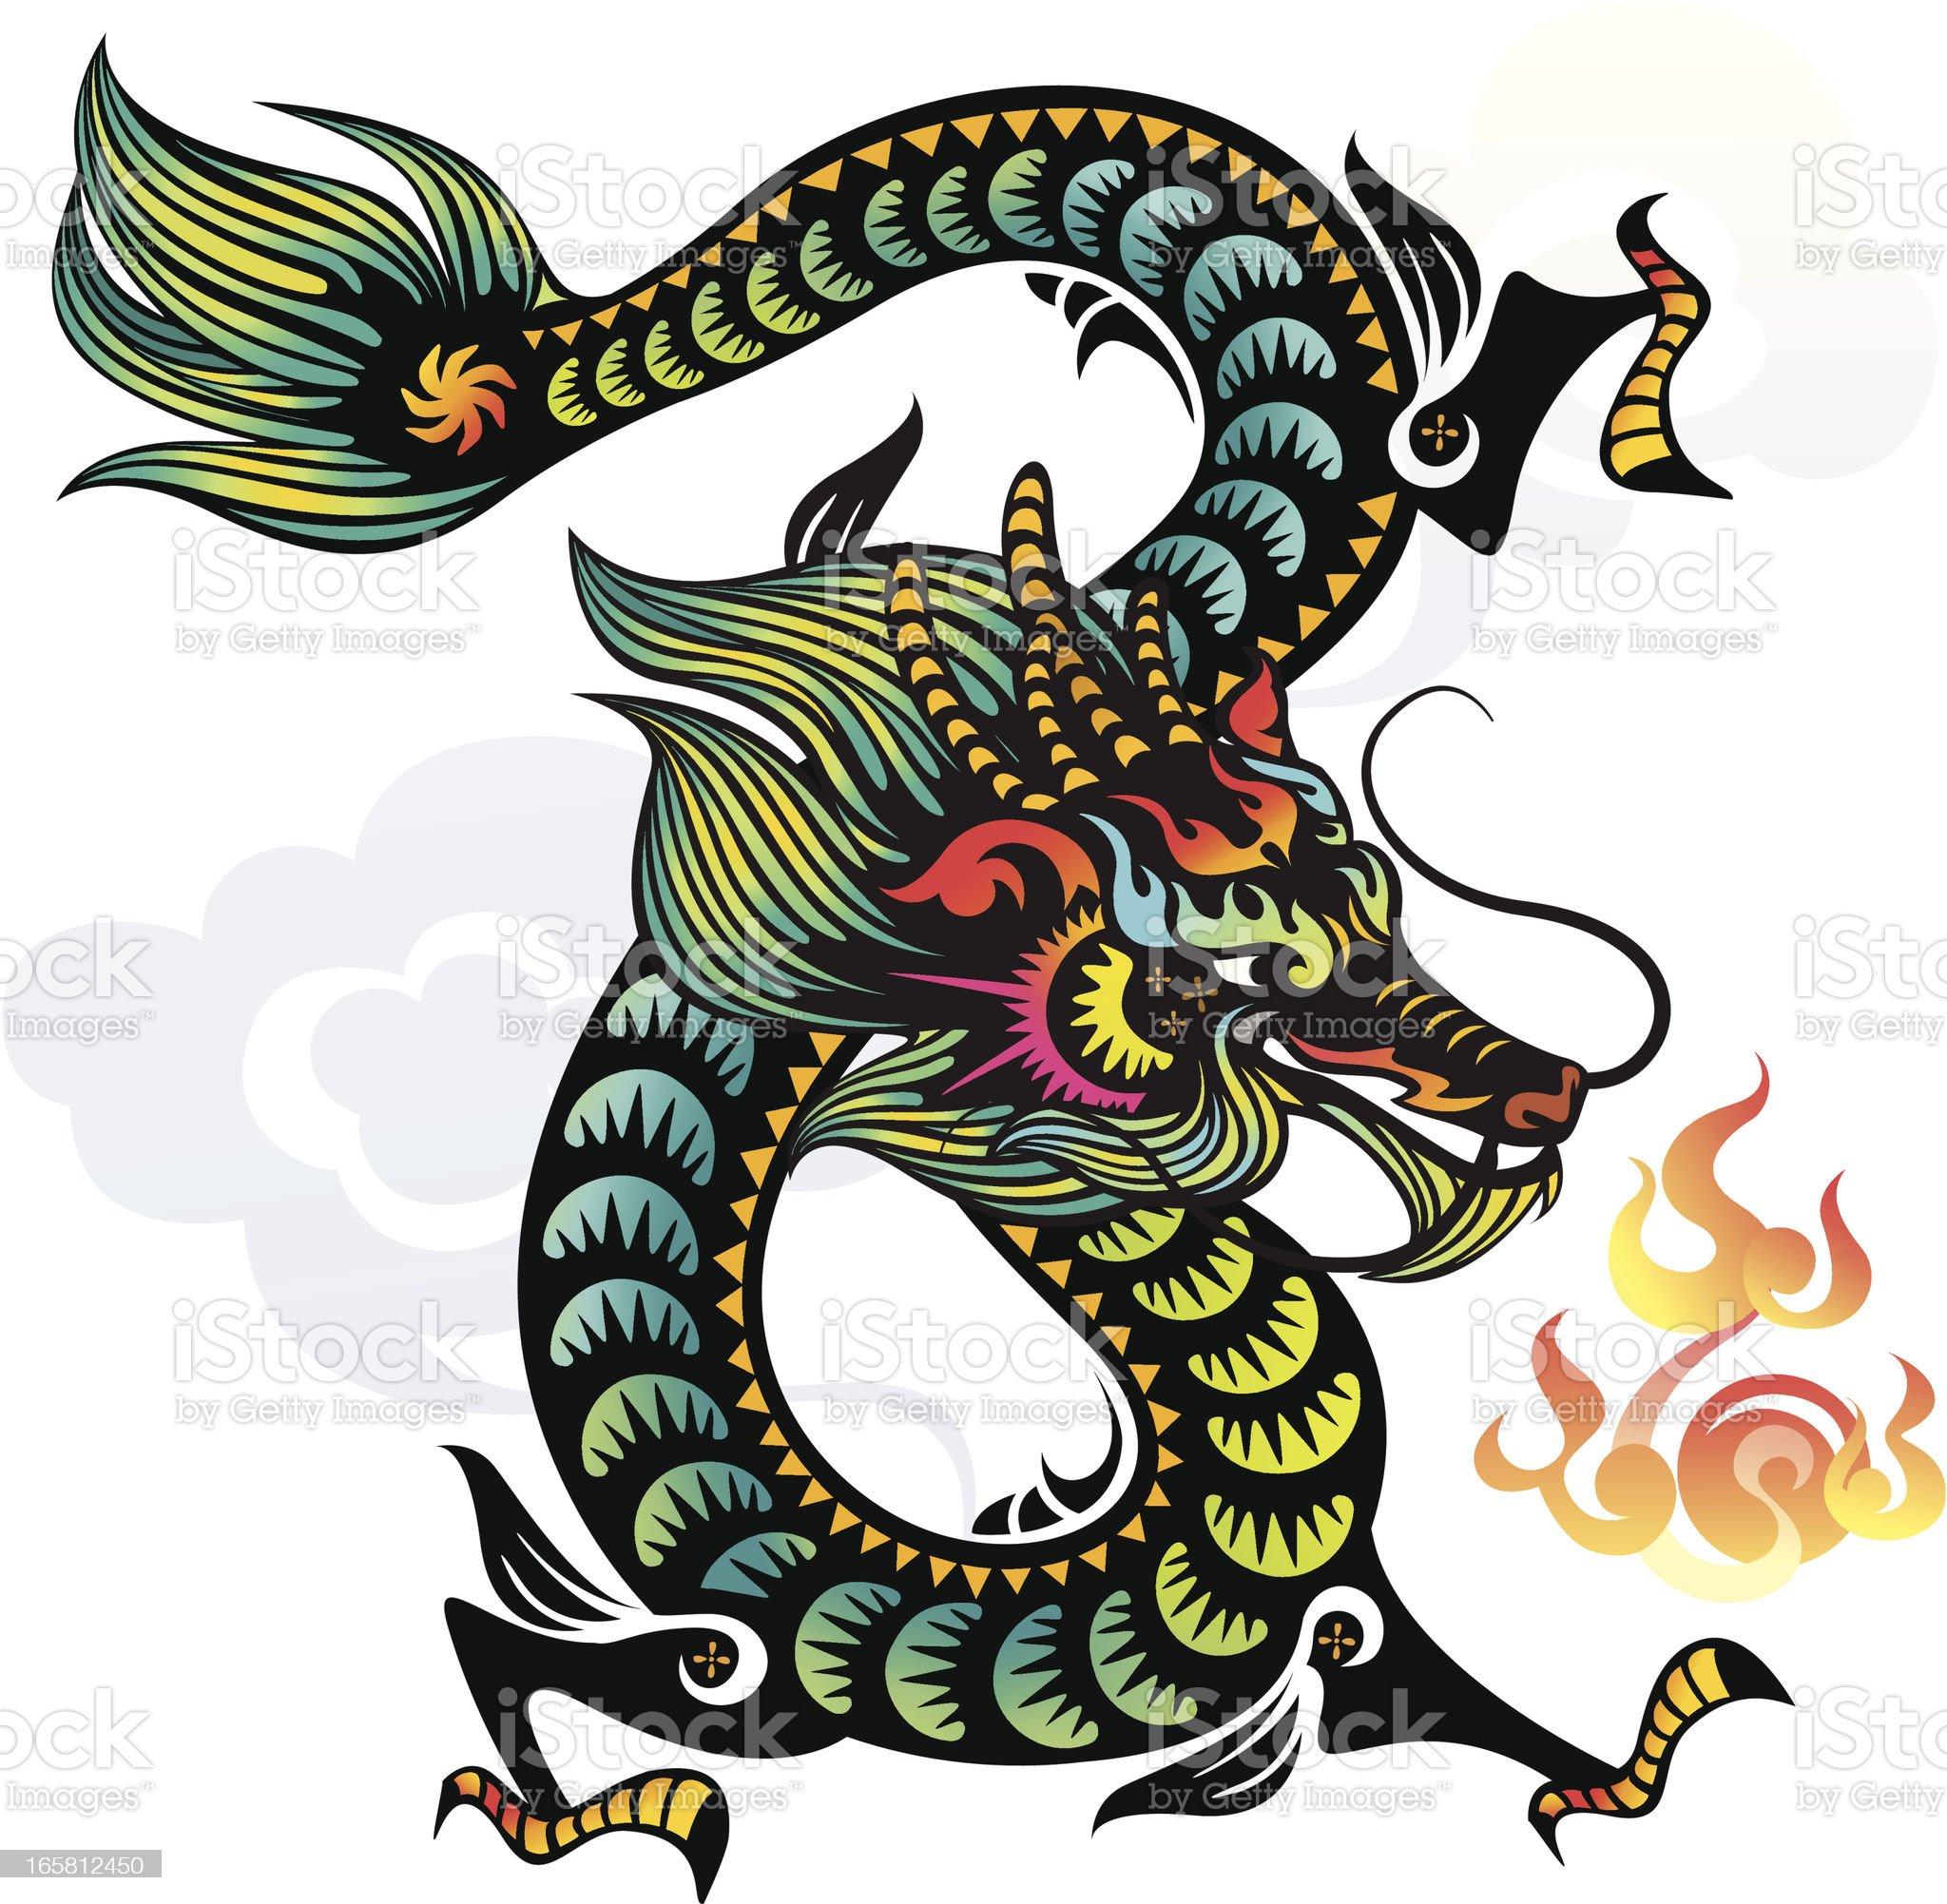 Chinese Dragon (Green) royalty-free stock vector art